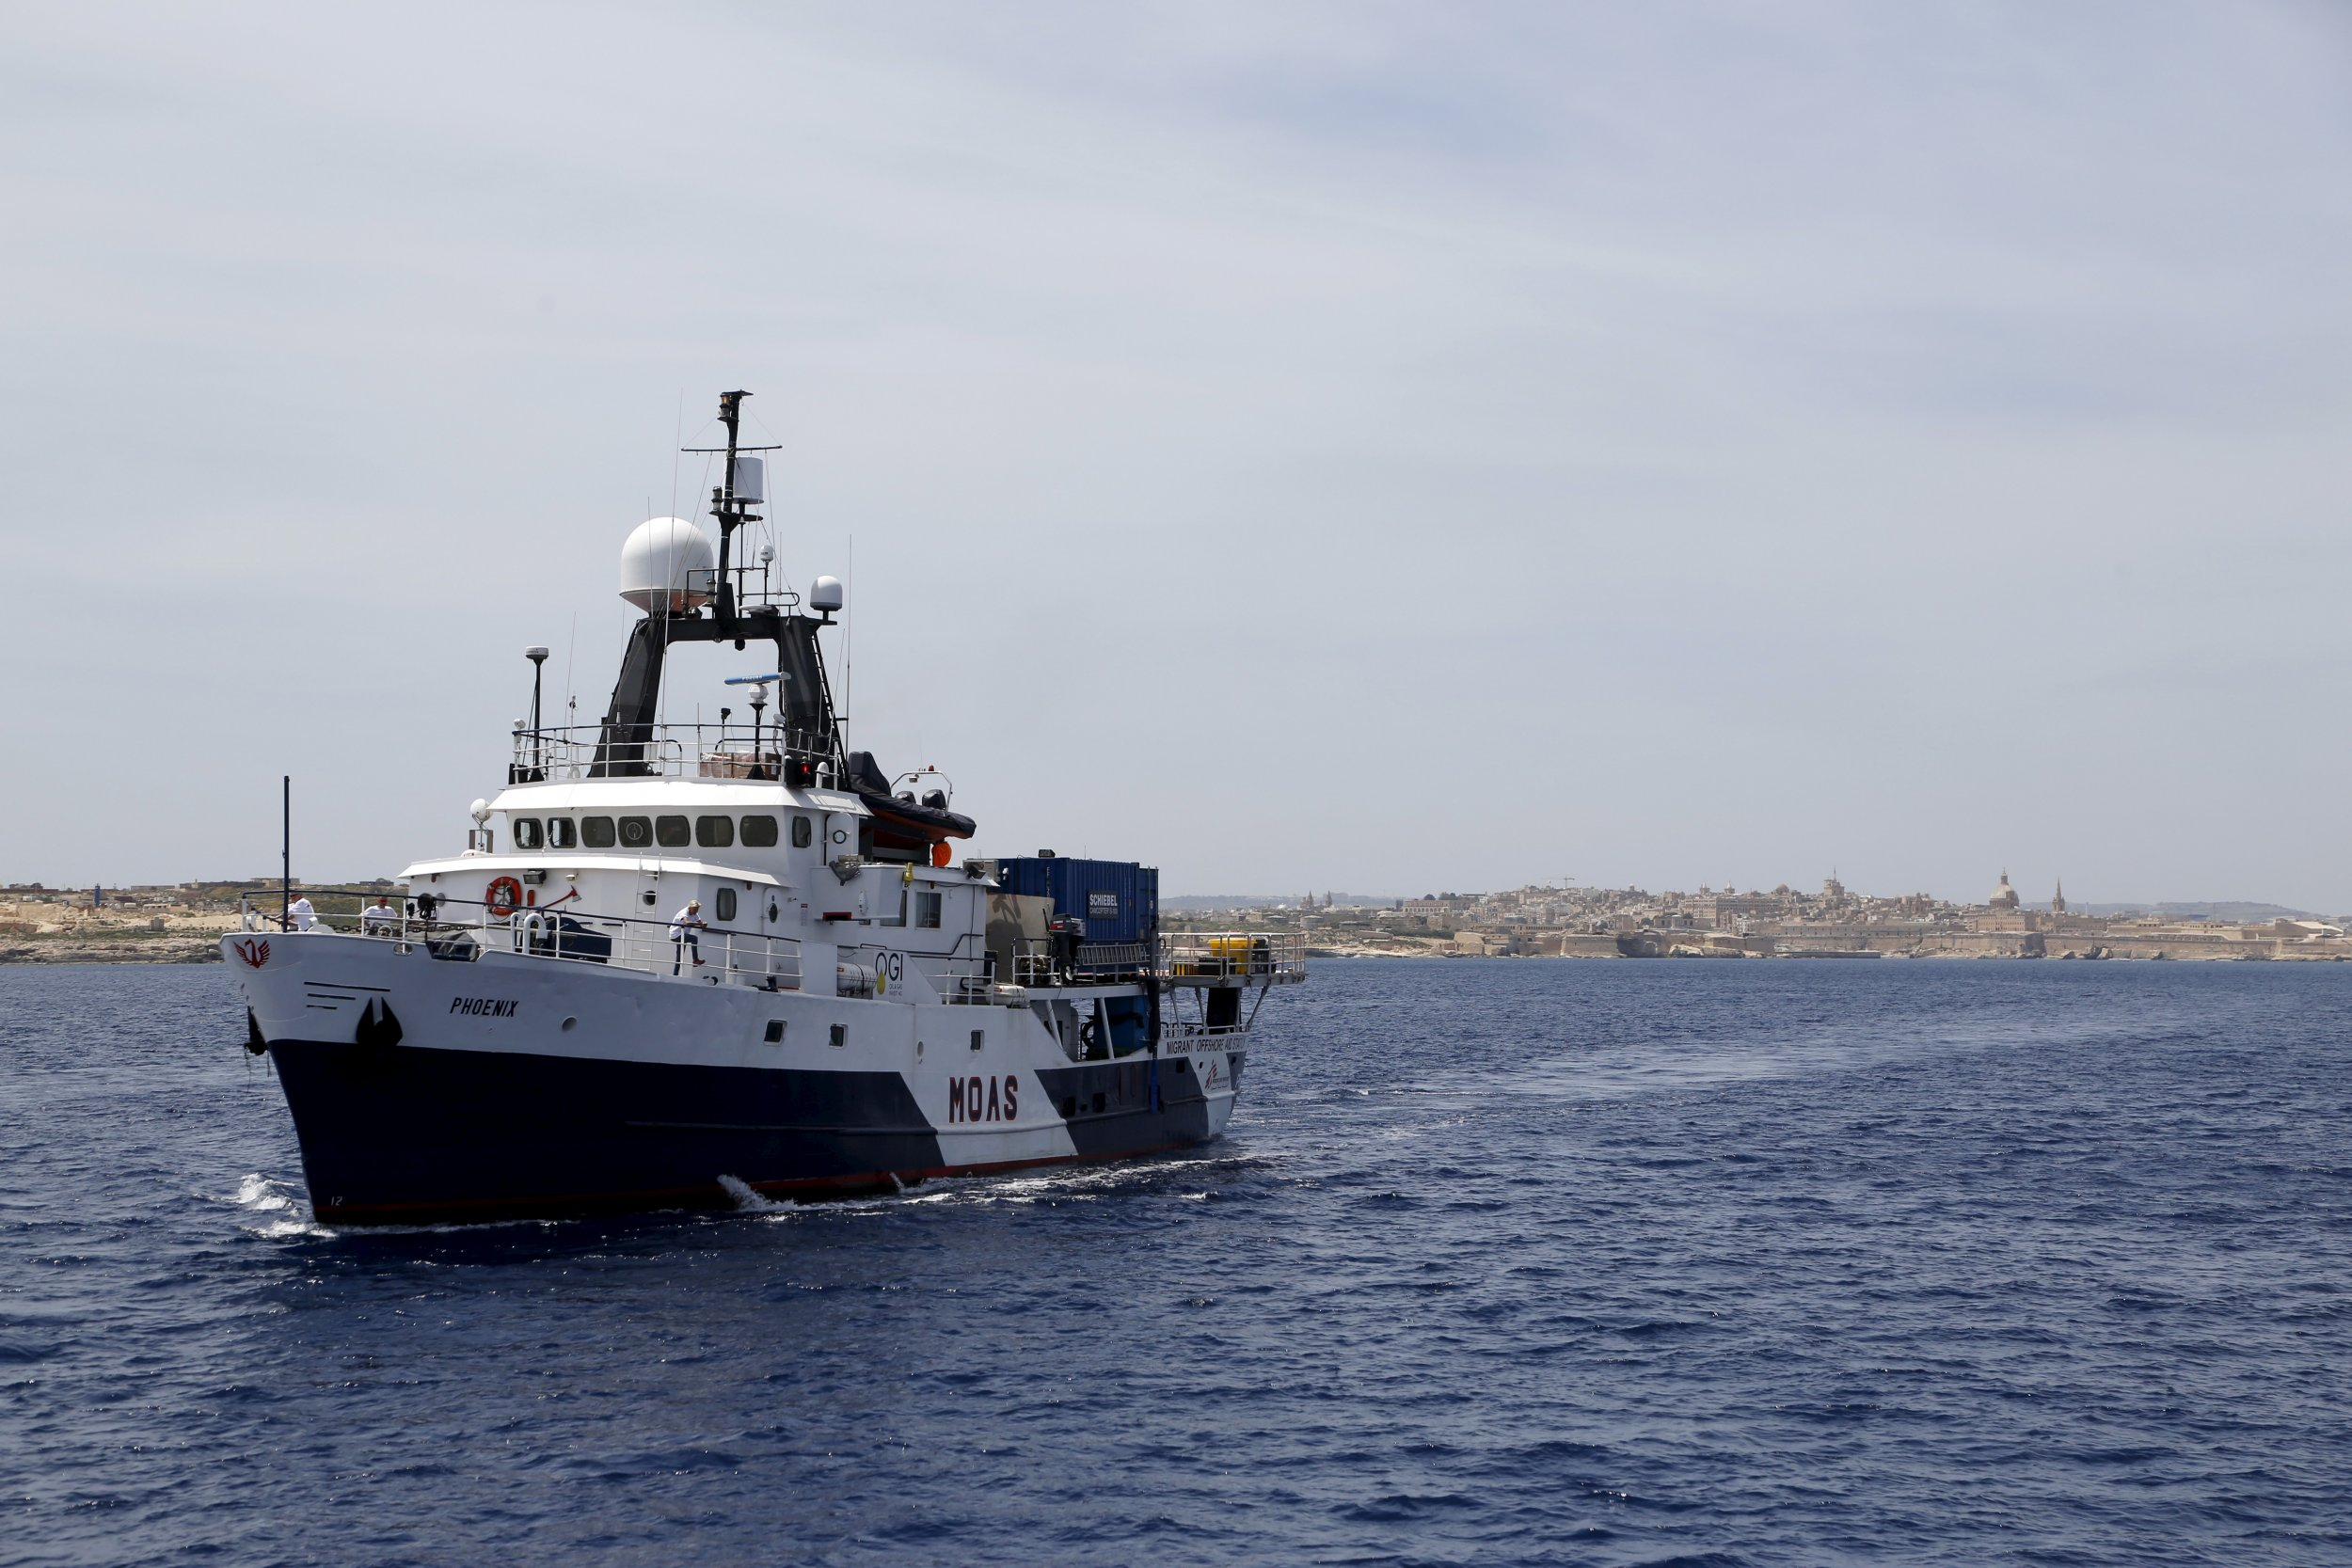 Mediterranean_migrant_0503